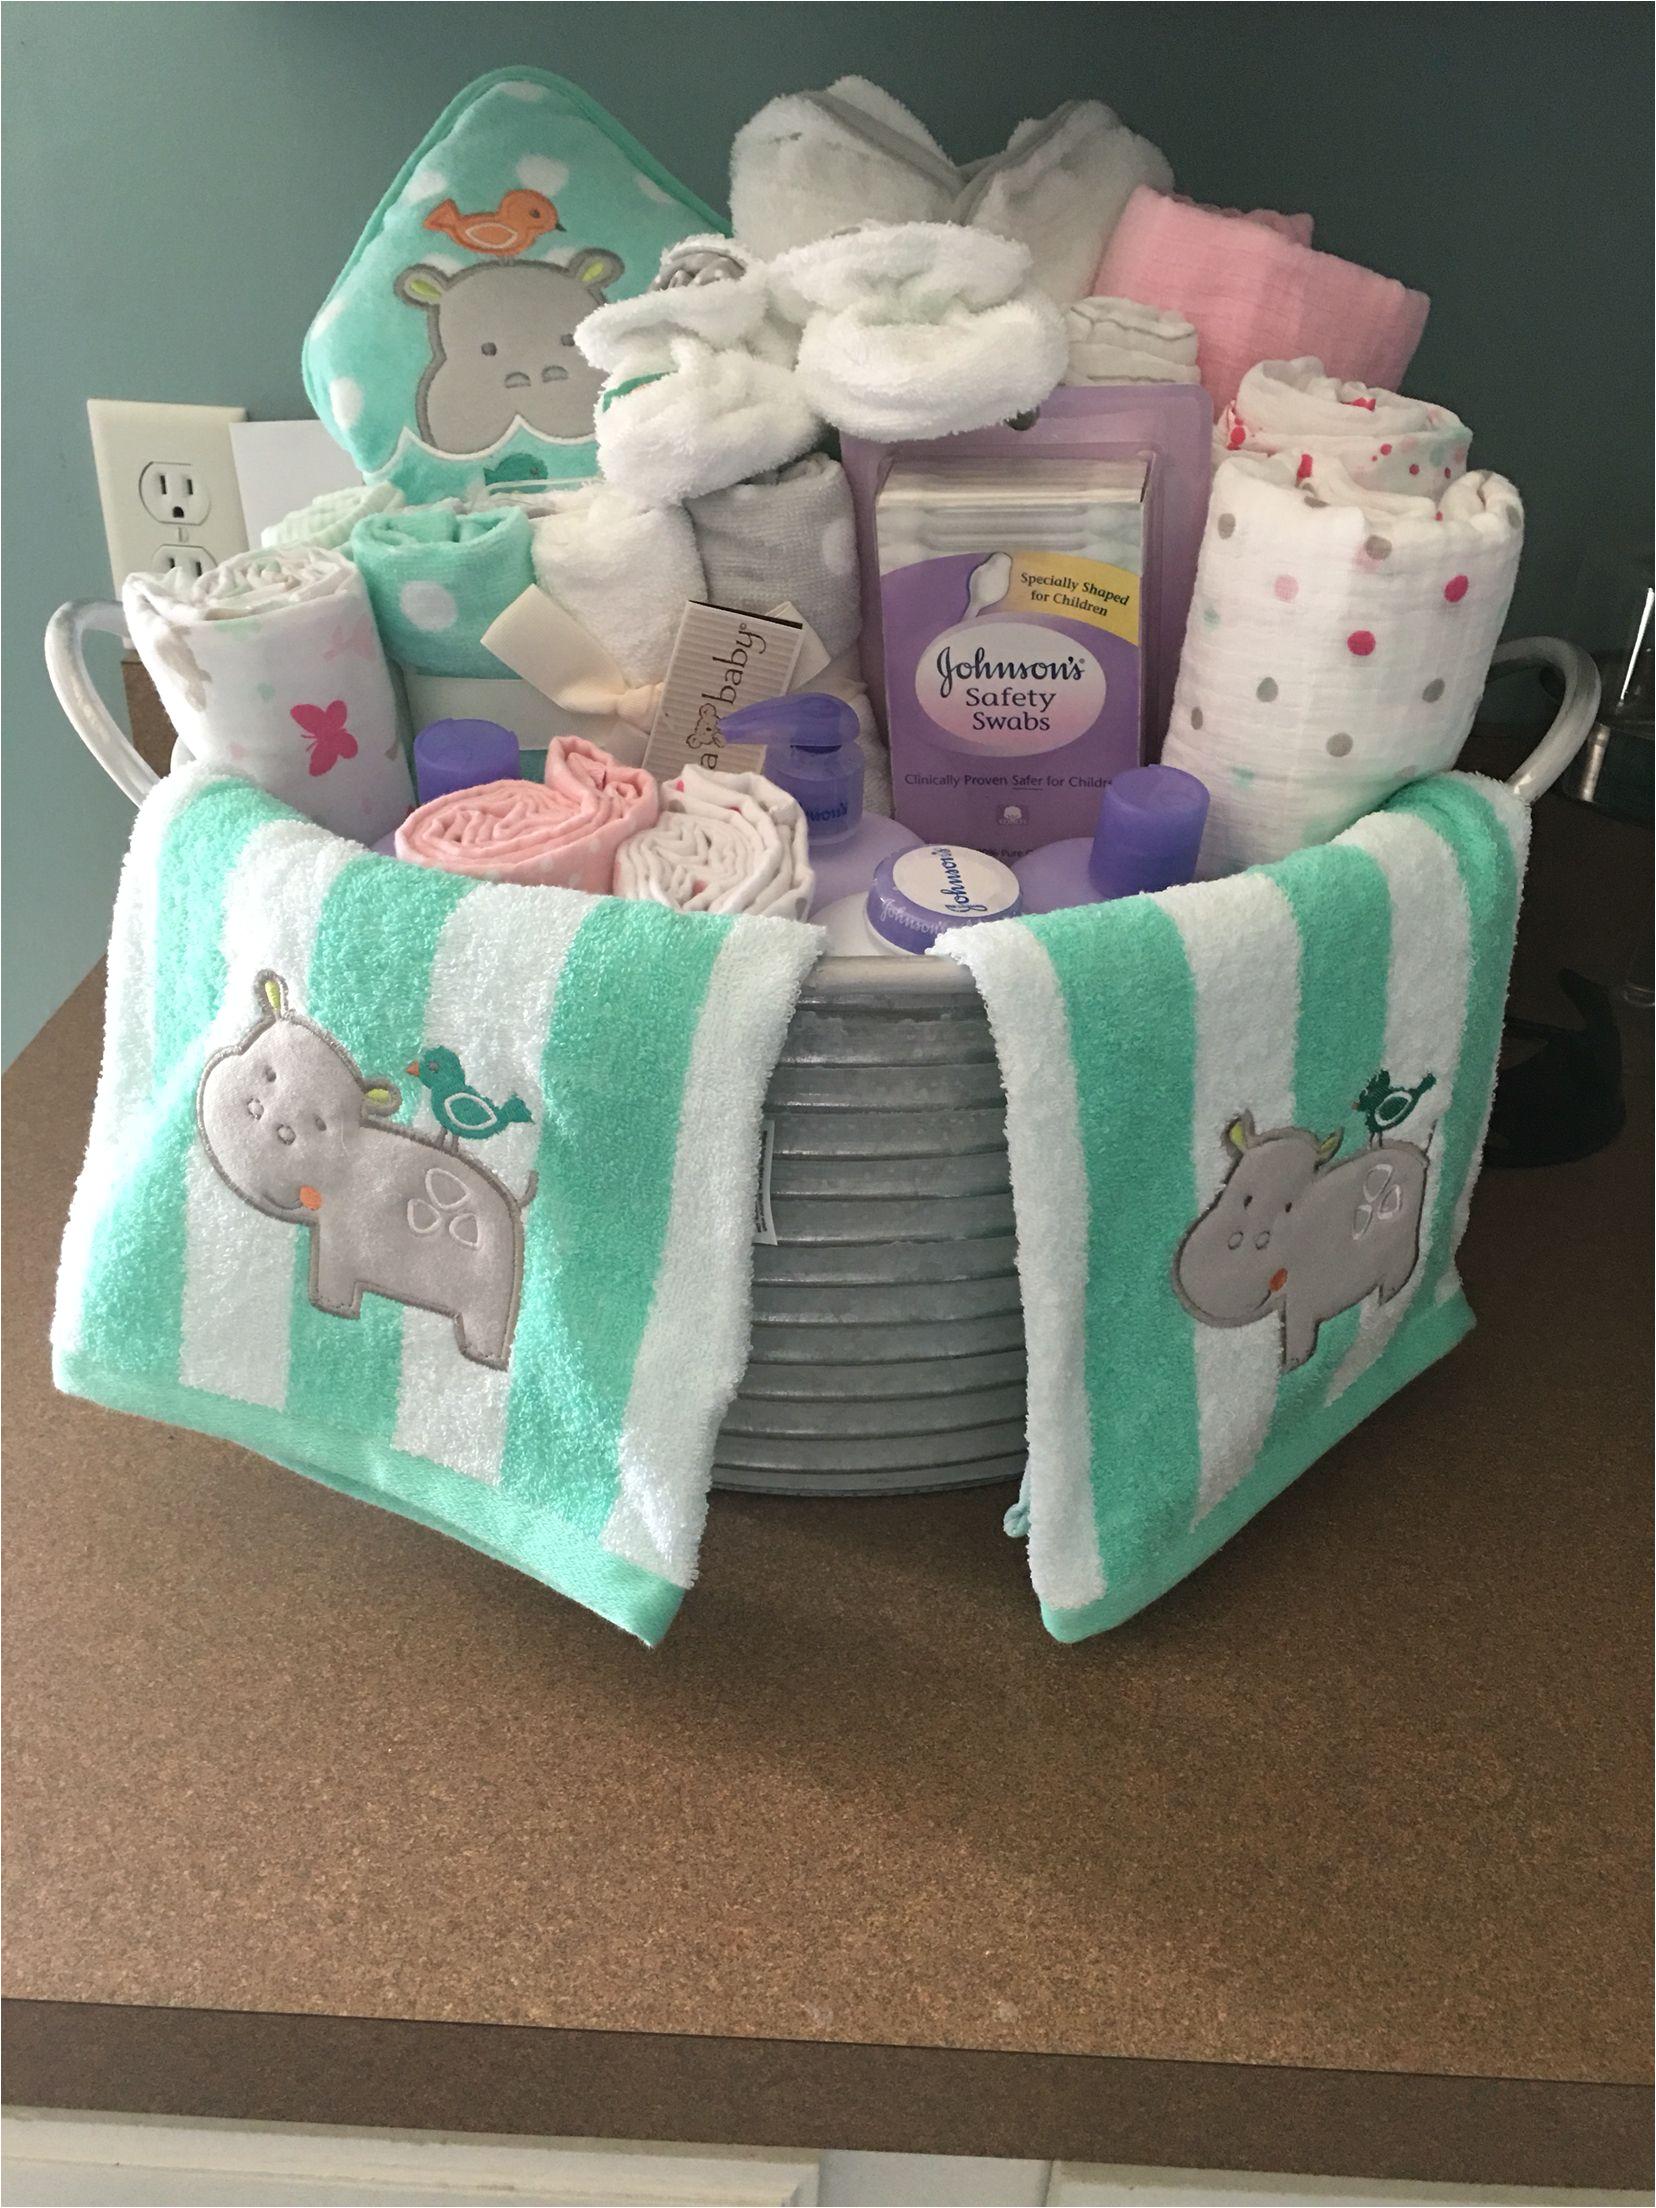 Baby Bathtub Gift Ideas Baby Shower Present I Made Galvanized Bucket with Baby